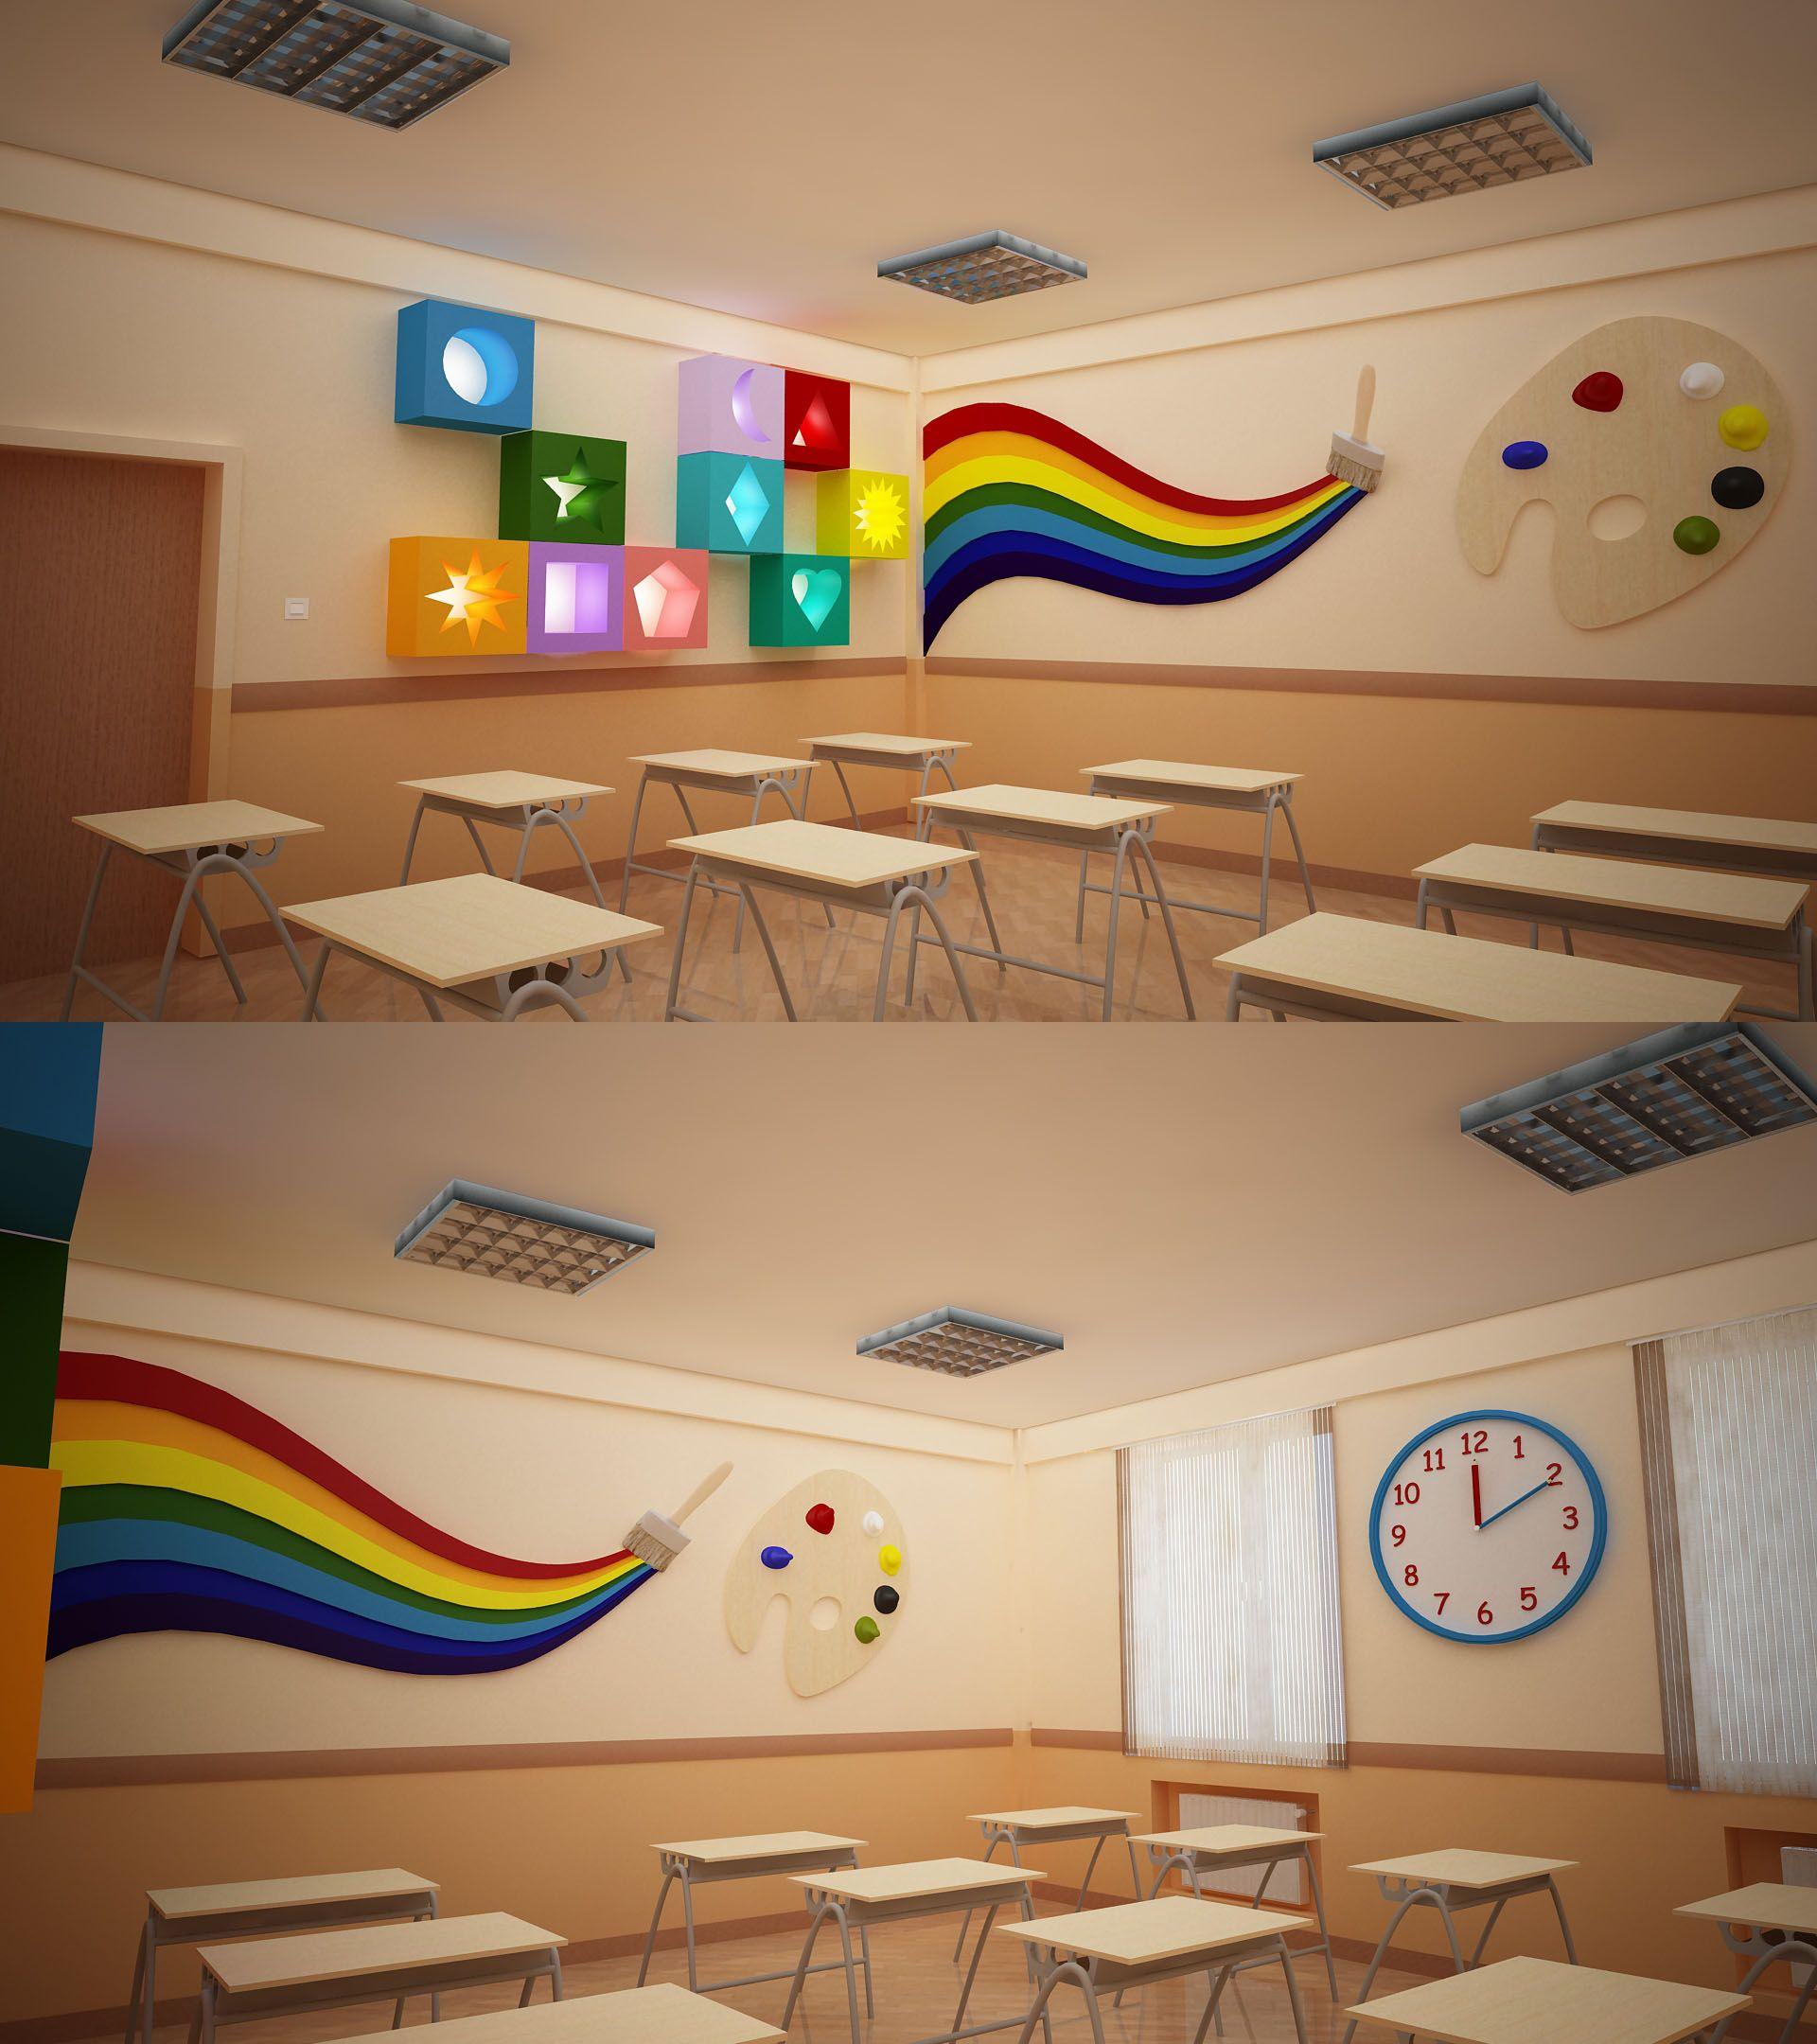 Modern Classroom Decorations : Bms baku modern school primary classroom design by